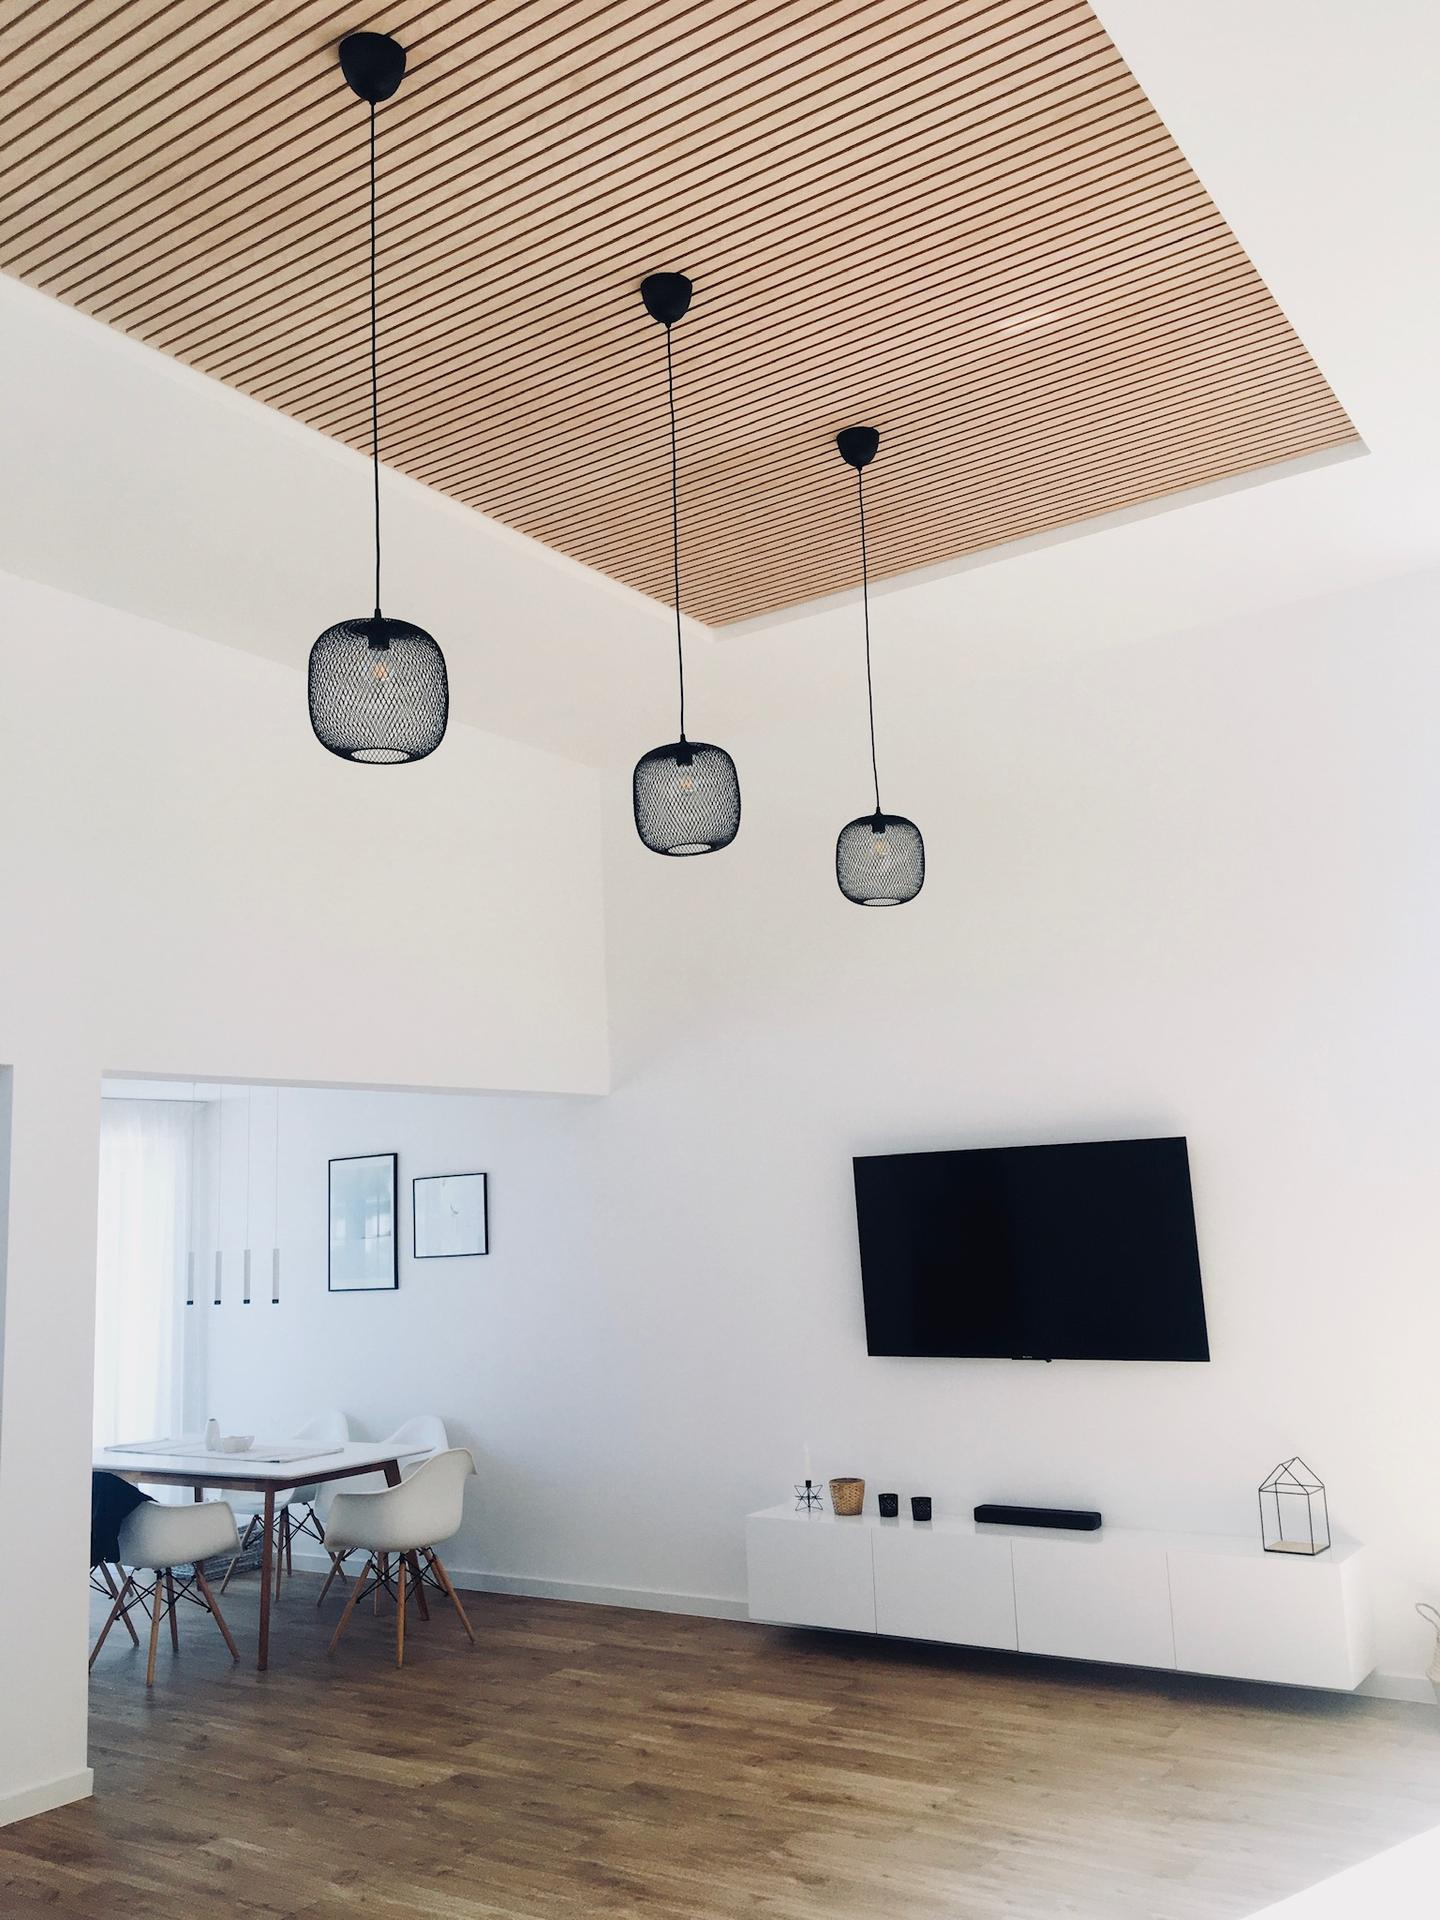 Lamelový panel na stenu/strop - vysoký strop, prevdenie natur lamelový panel